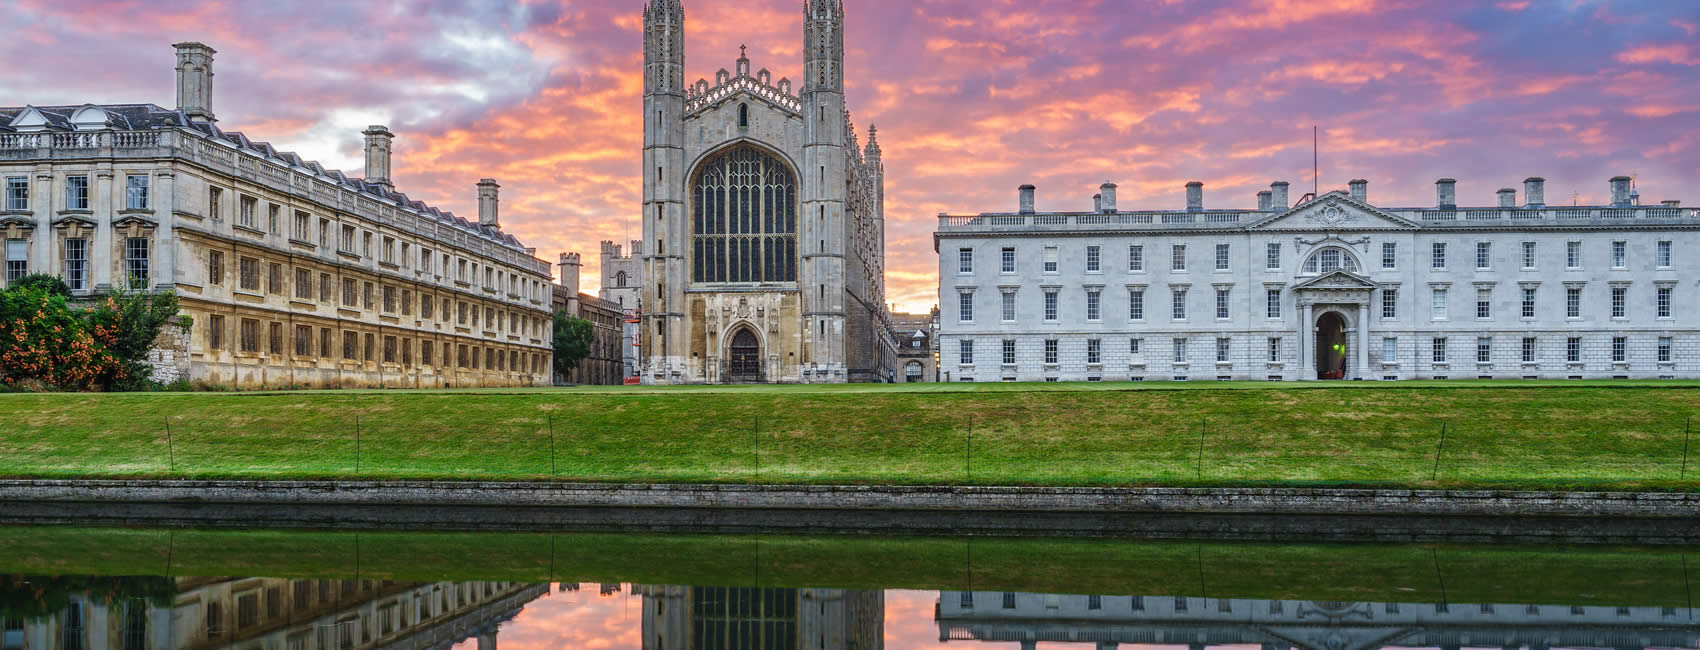 University grounds of Cambridge